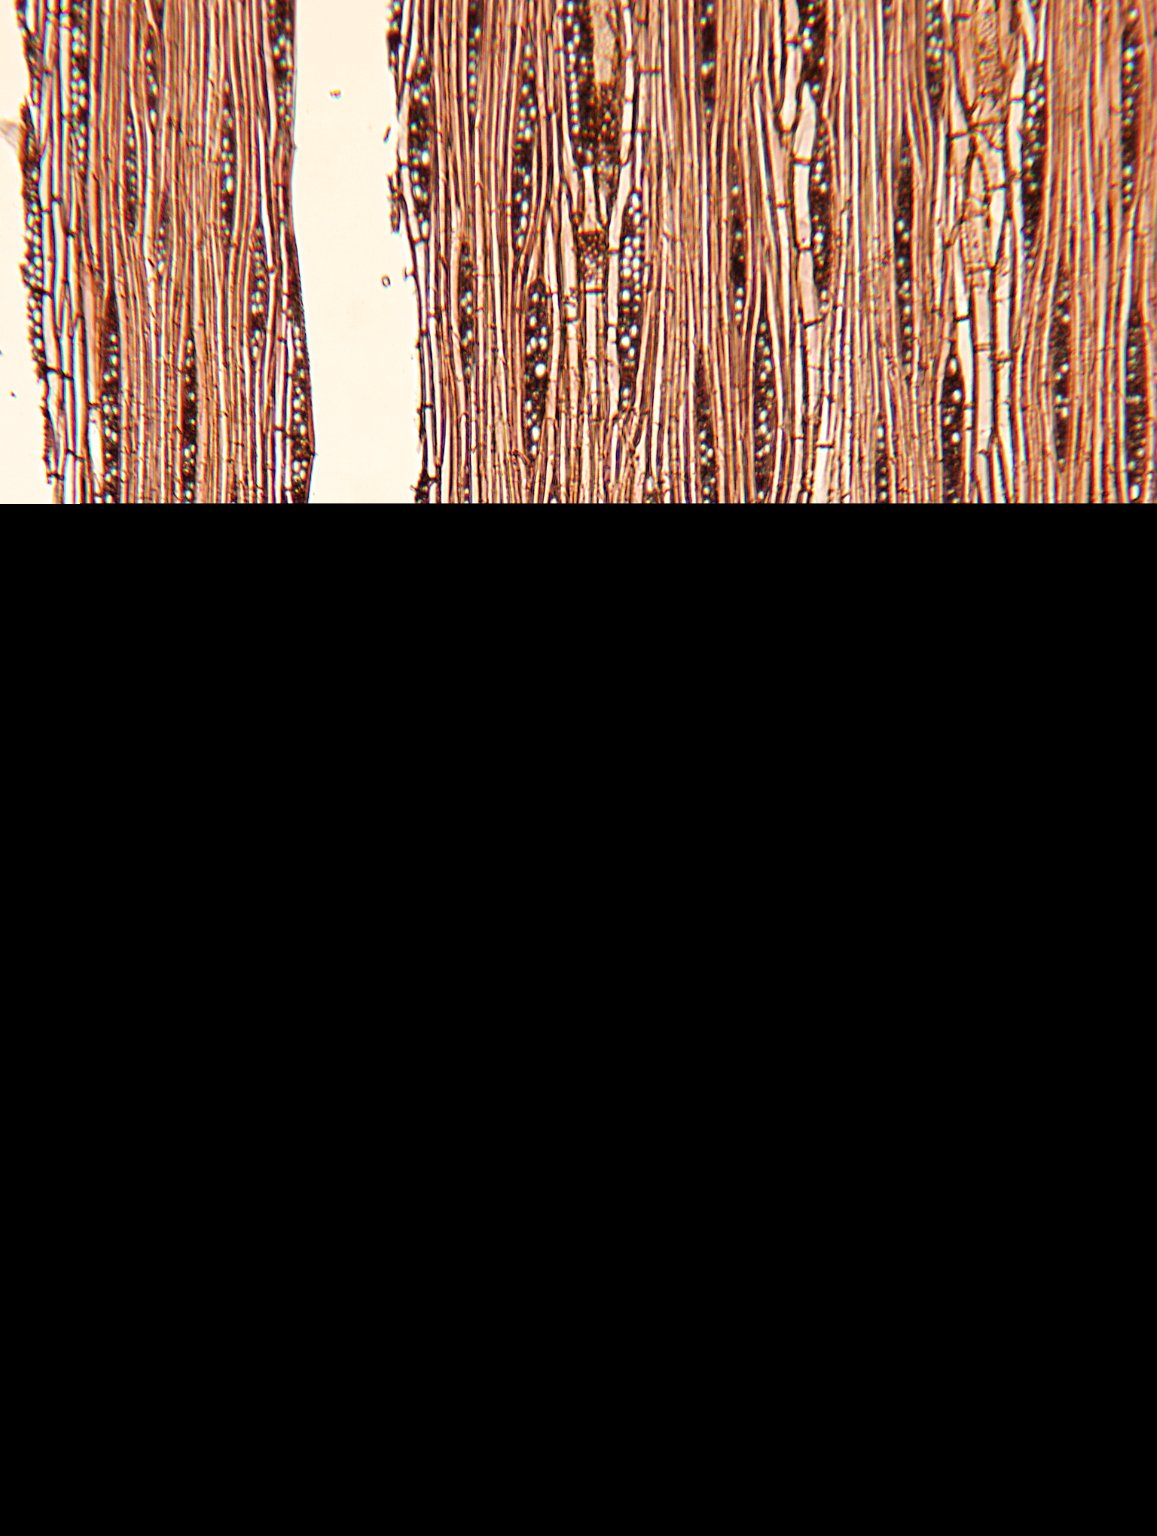 LEGUMINOSAE CAESALPINIOIDEAE Burkea africana